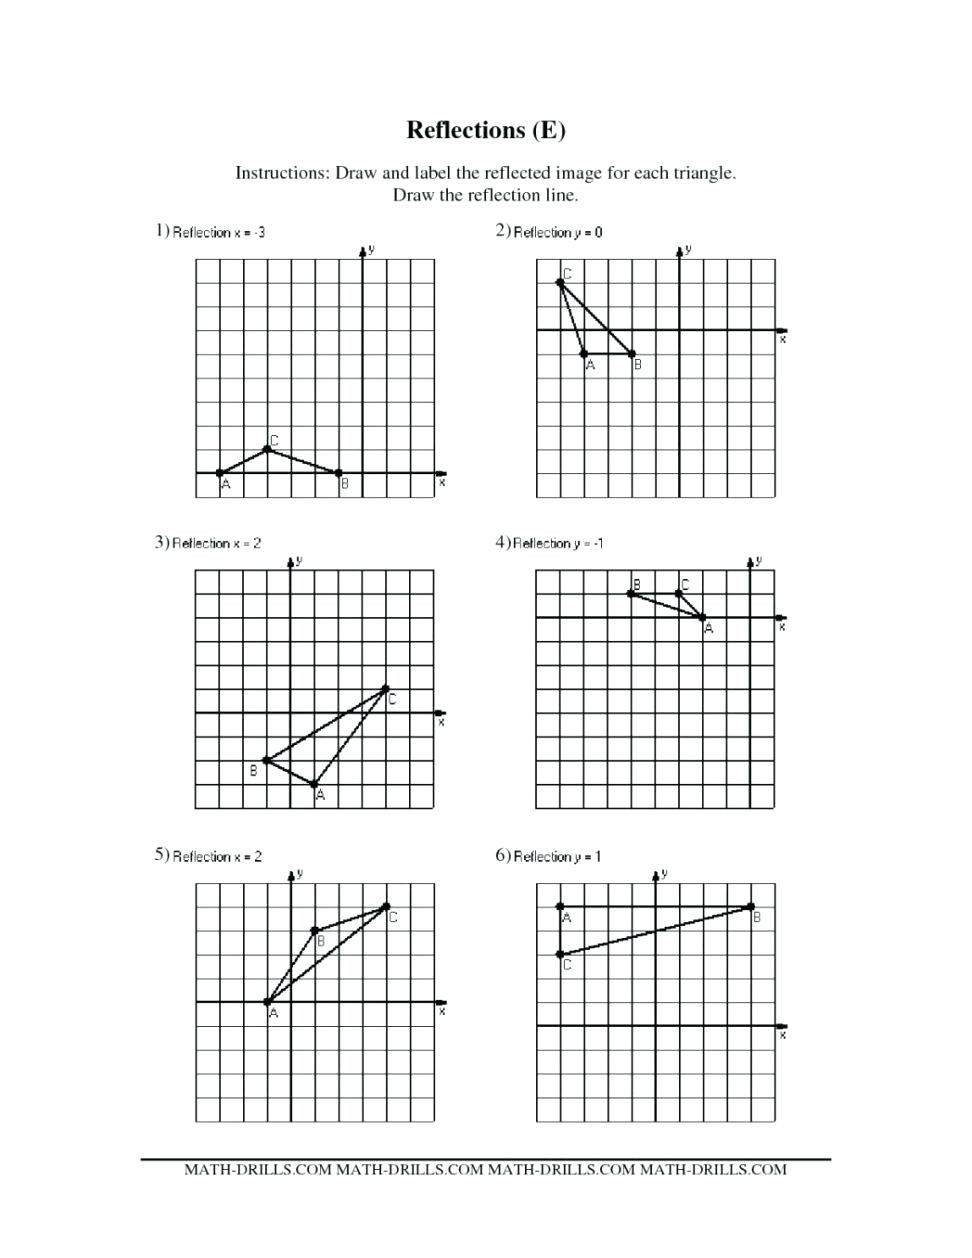 Composition Of Transformations Worksheet Reflections Worksheet Answer Key Nidecmege